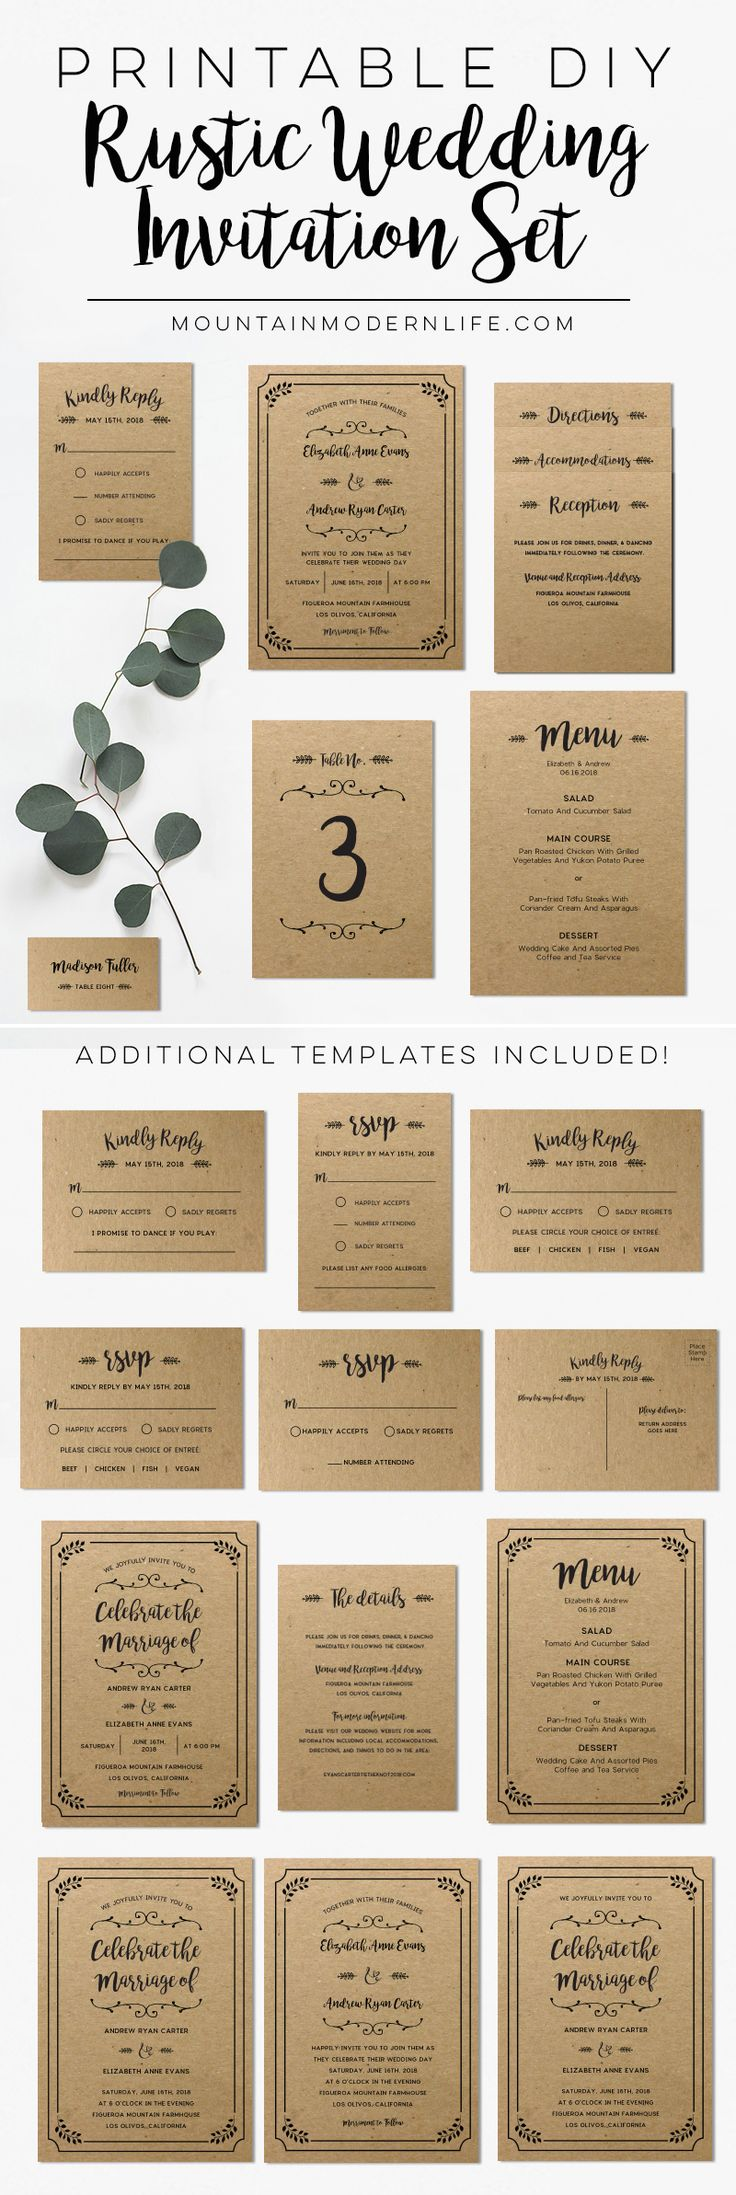 Printable Rustic Wedding Invitation Set | Diy wedding ...